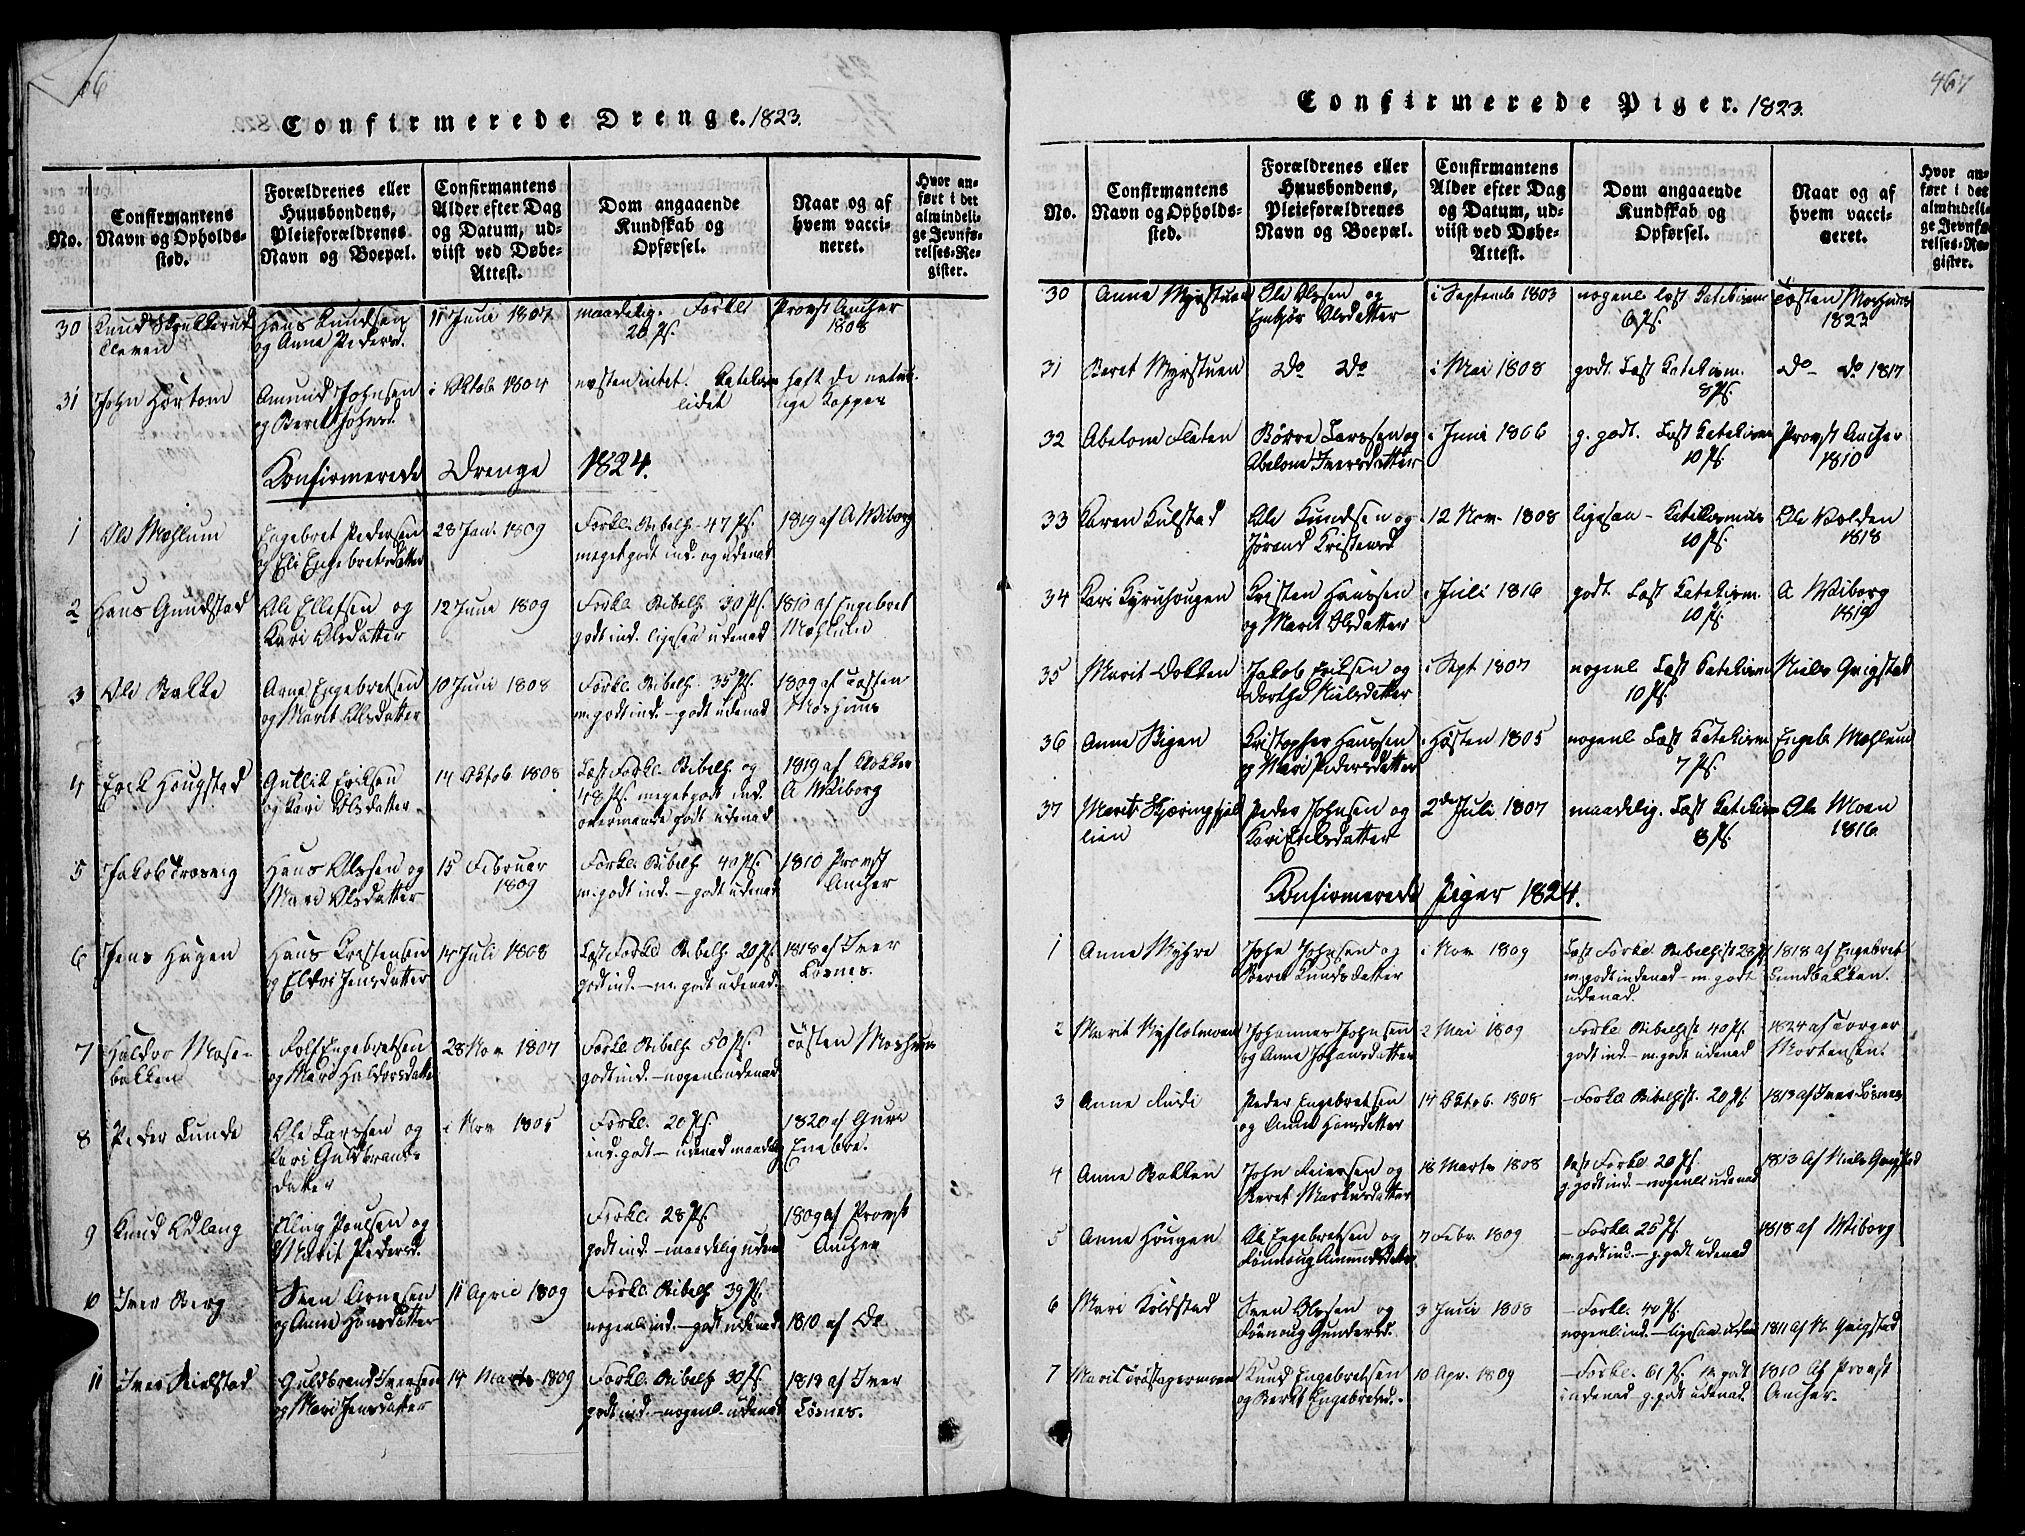 SAH, Ringebu prestekontor, Klokkerbok nr. 1, 1821-1839, s. 466-467